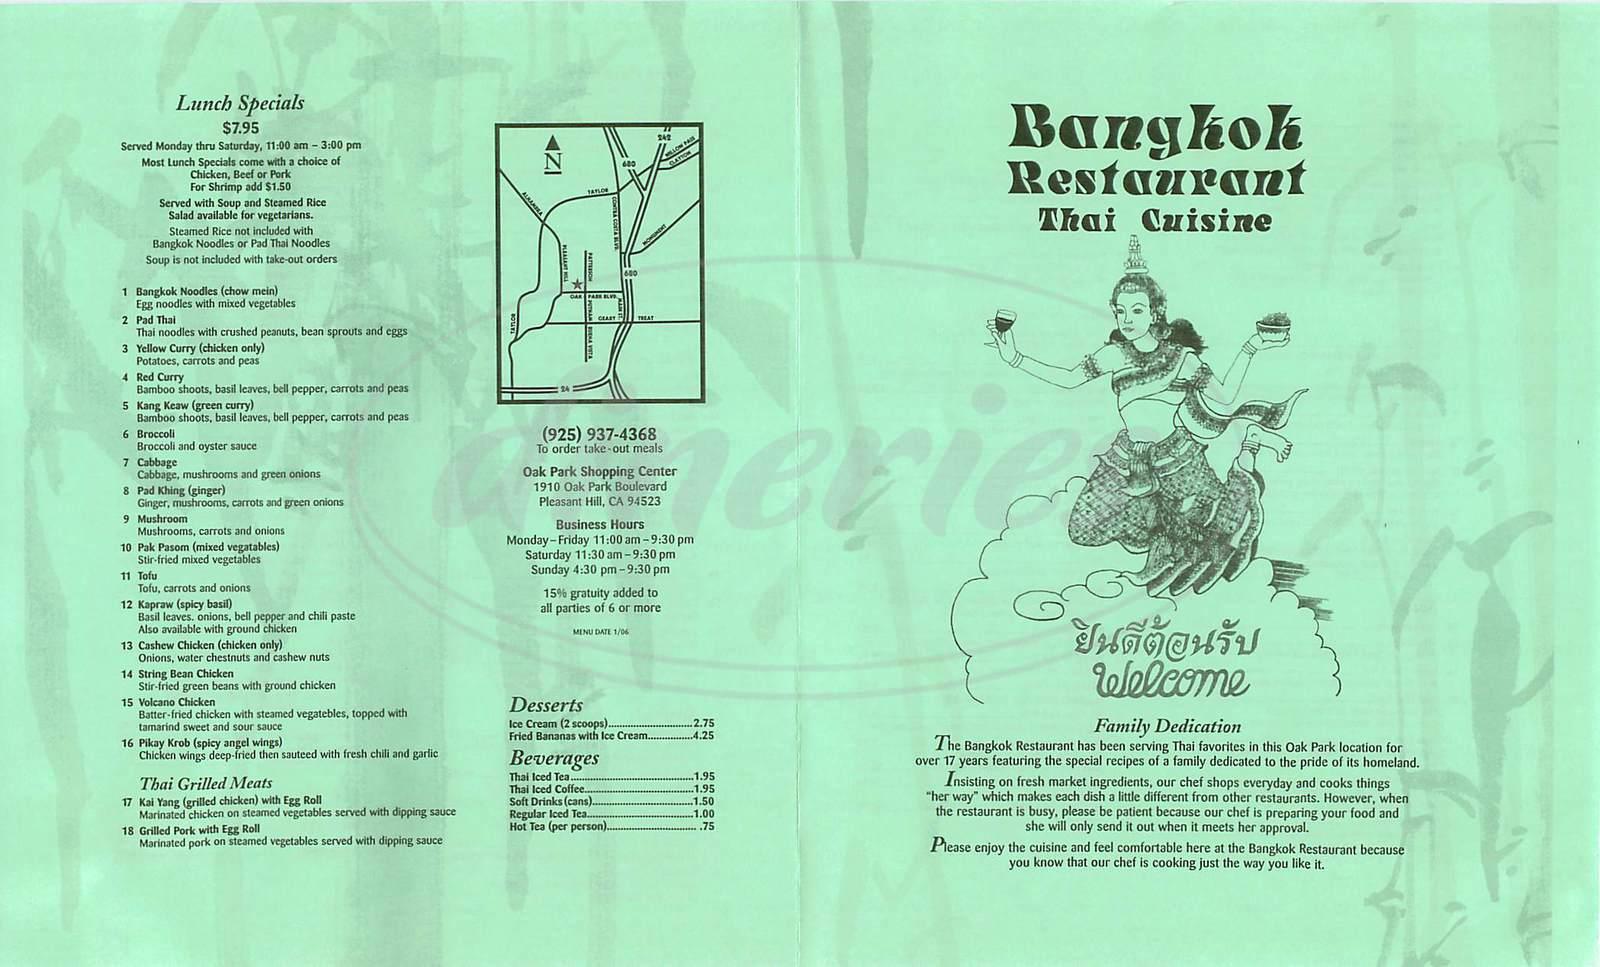 menu for Bangkok Restaurant